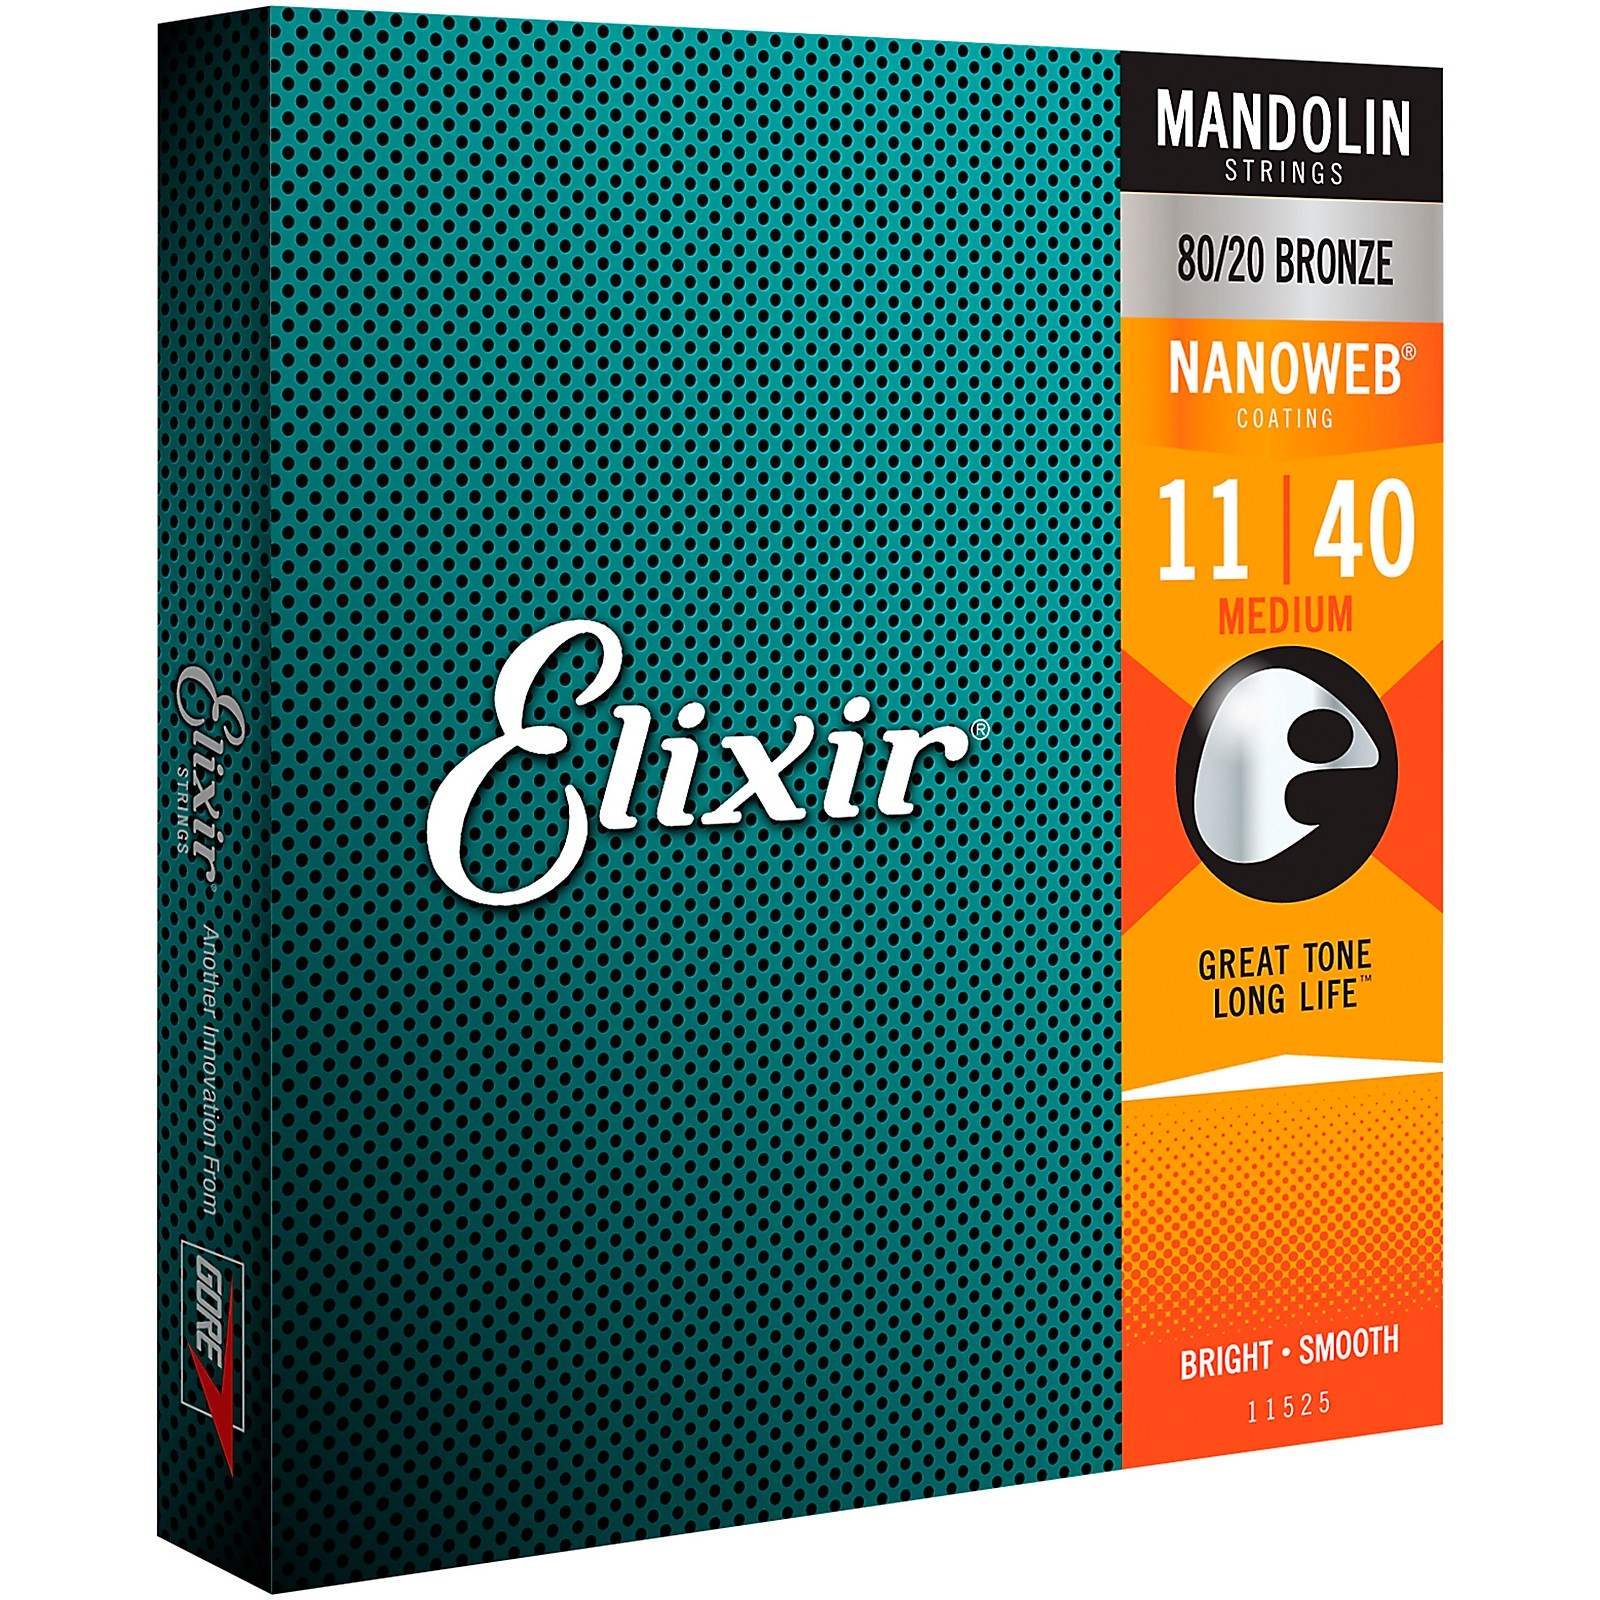 Elixir Mandolin Strings with NANOWEB Coating, Medium (.011-.040)